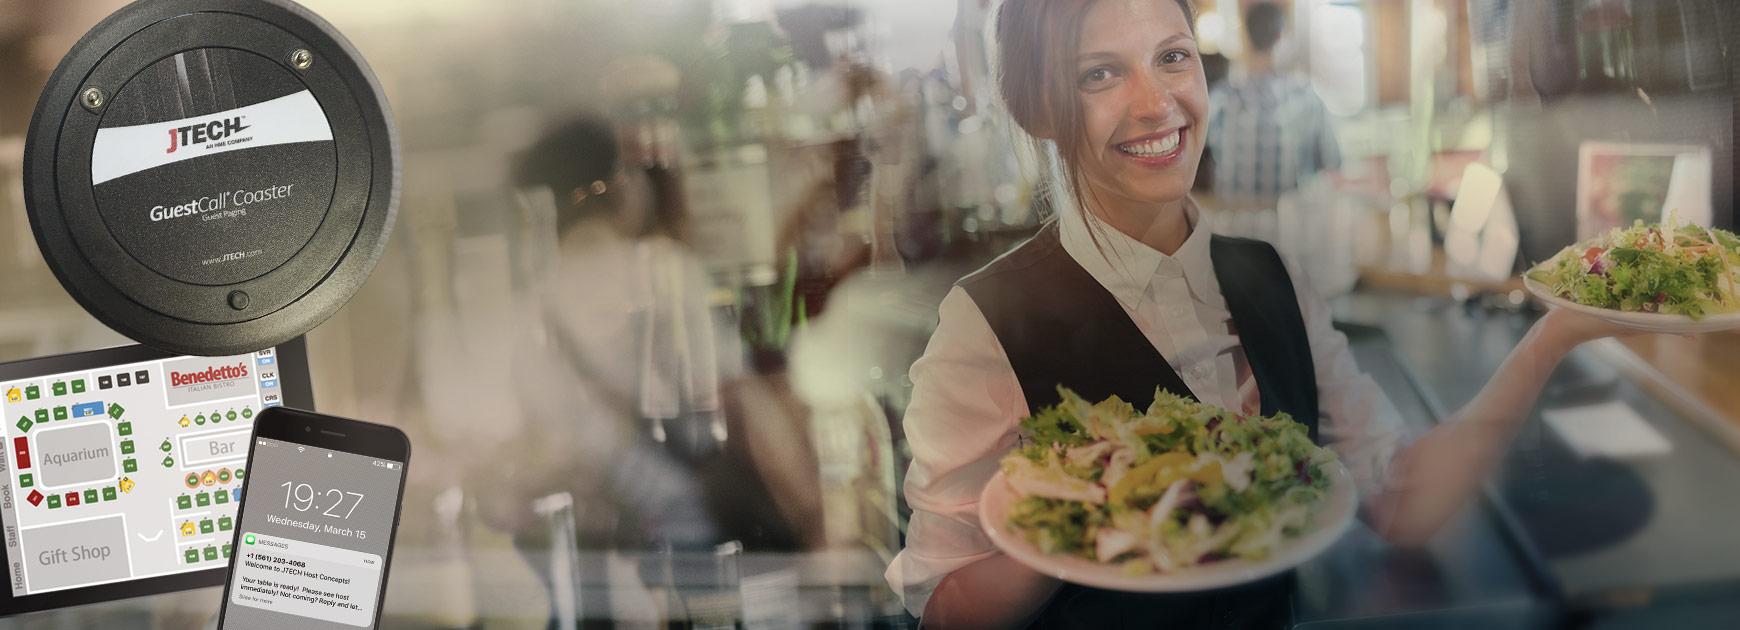 JT-restaurantv2-warm-web.jpg